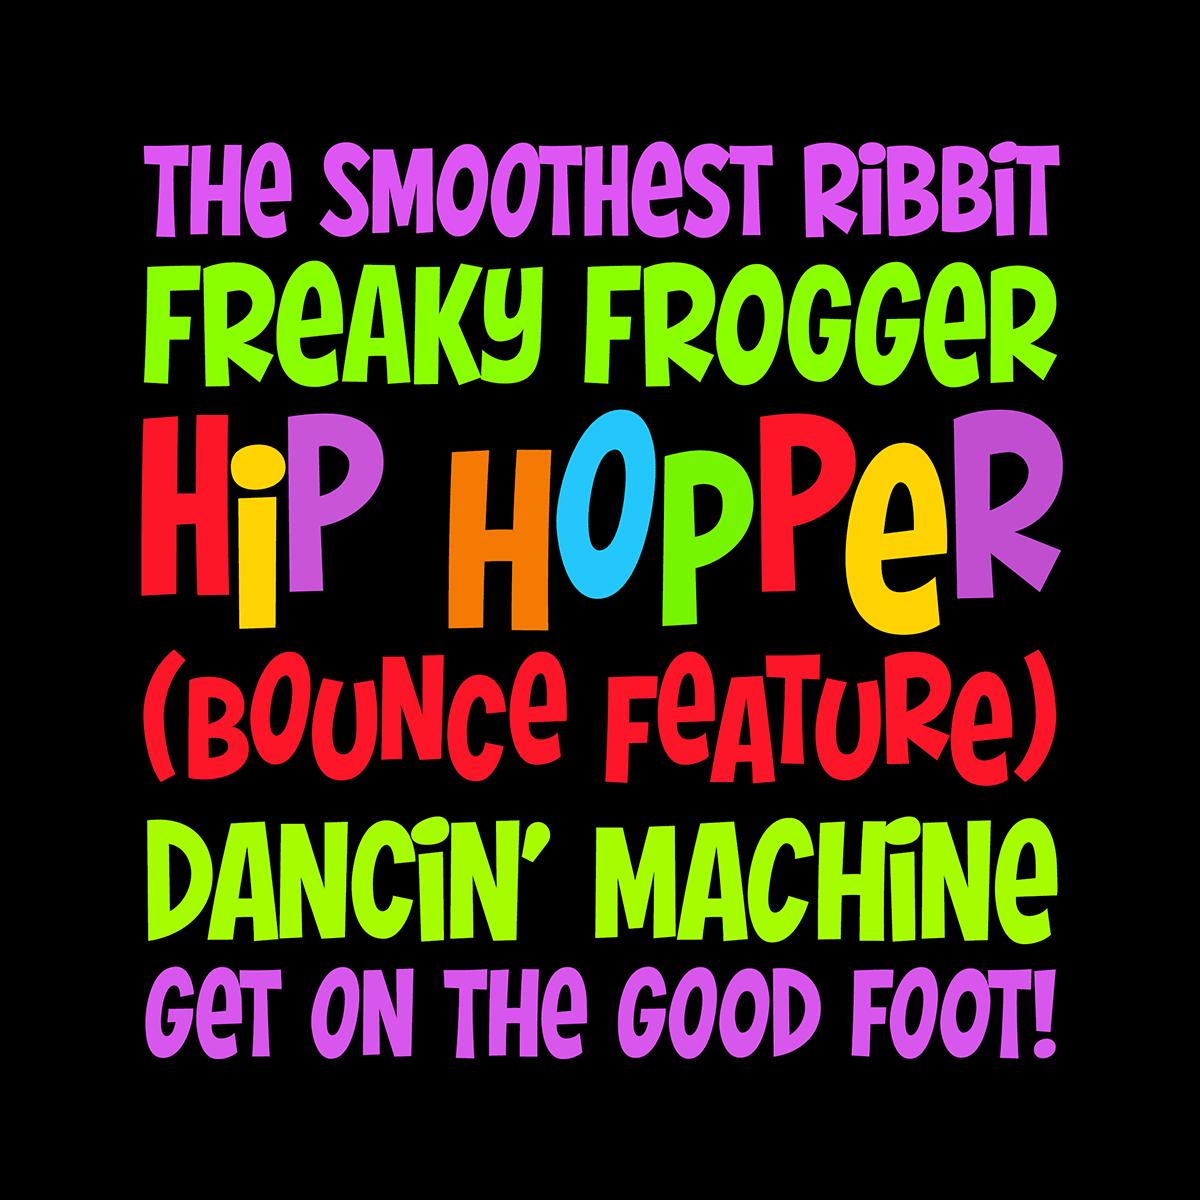 Hip Hopper font by Pink Broccoli